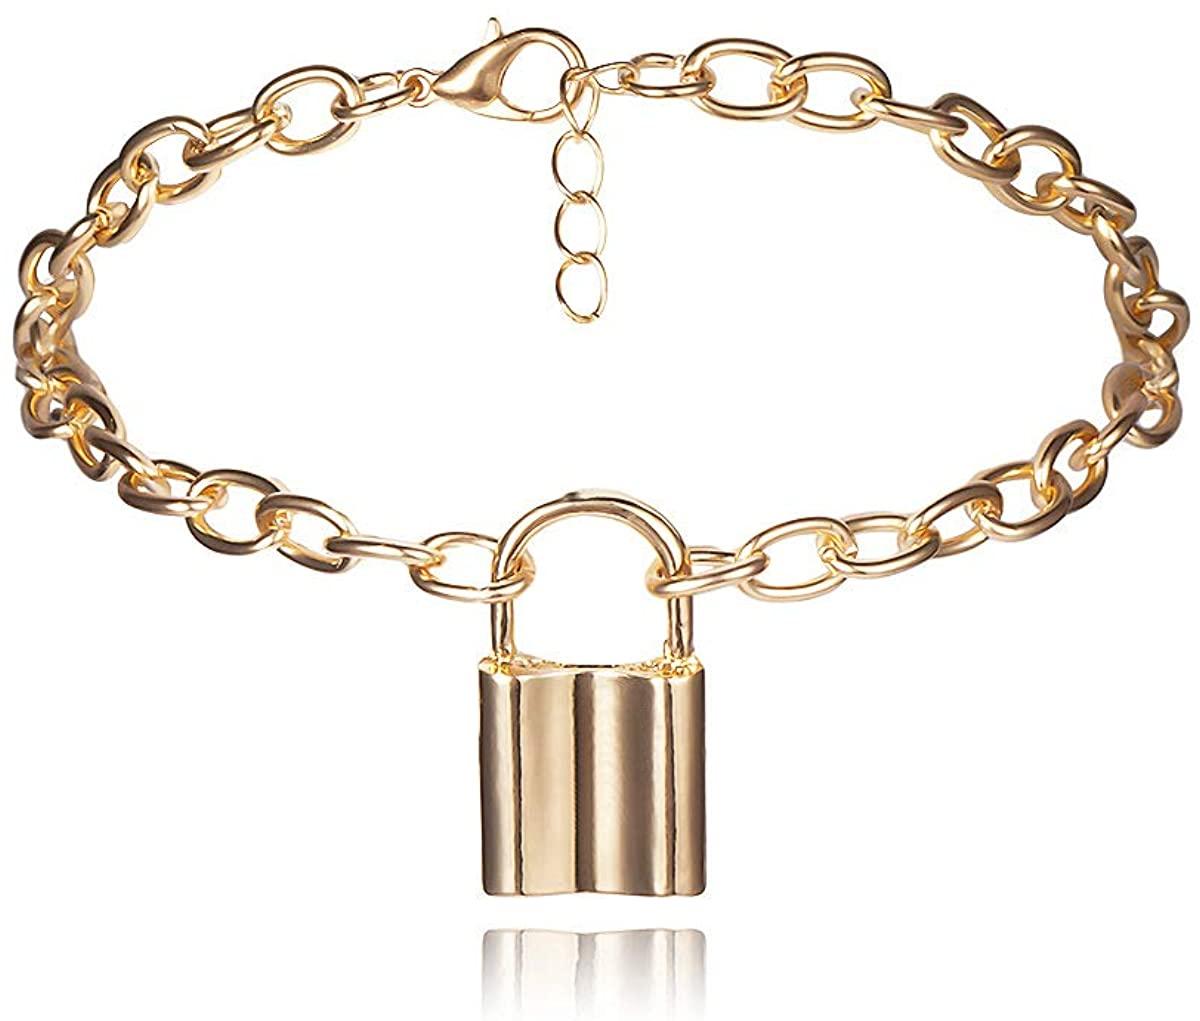 A Lock Anklet Bracelet for Women - Padlock Charm Foot Bracelet Anklet Adjustable - Foot Chain Jewelry for Women Girls